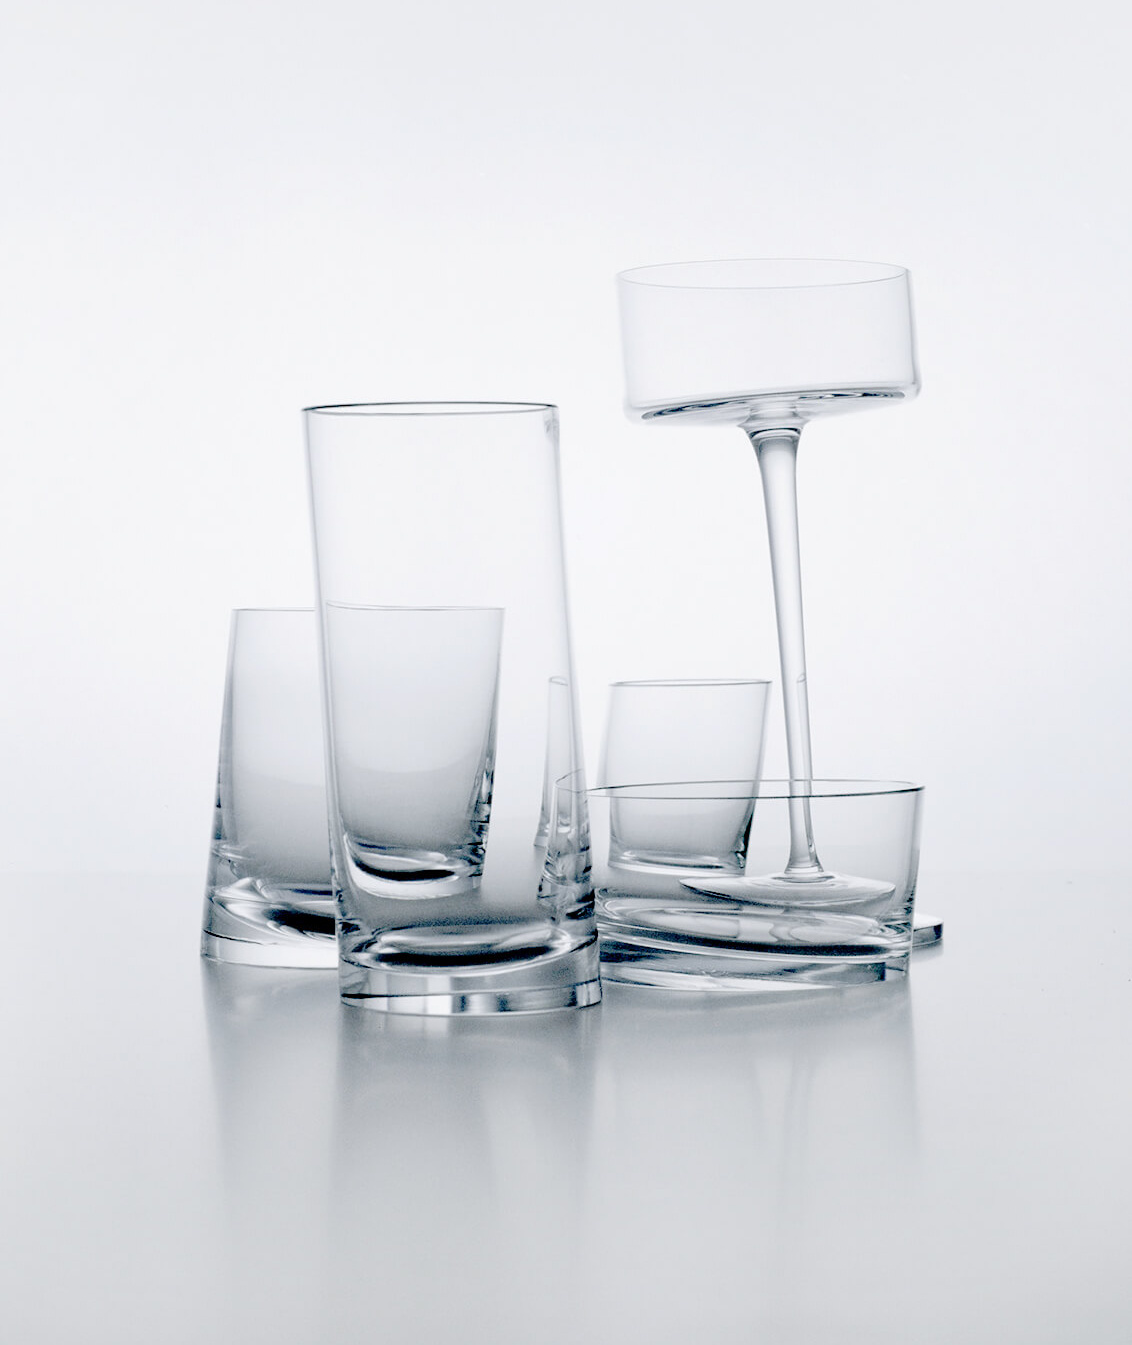 lucyd_SCOTT_glass_1_hochkant Kopie